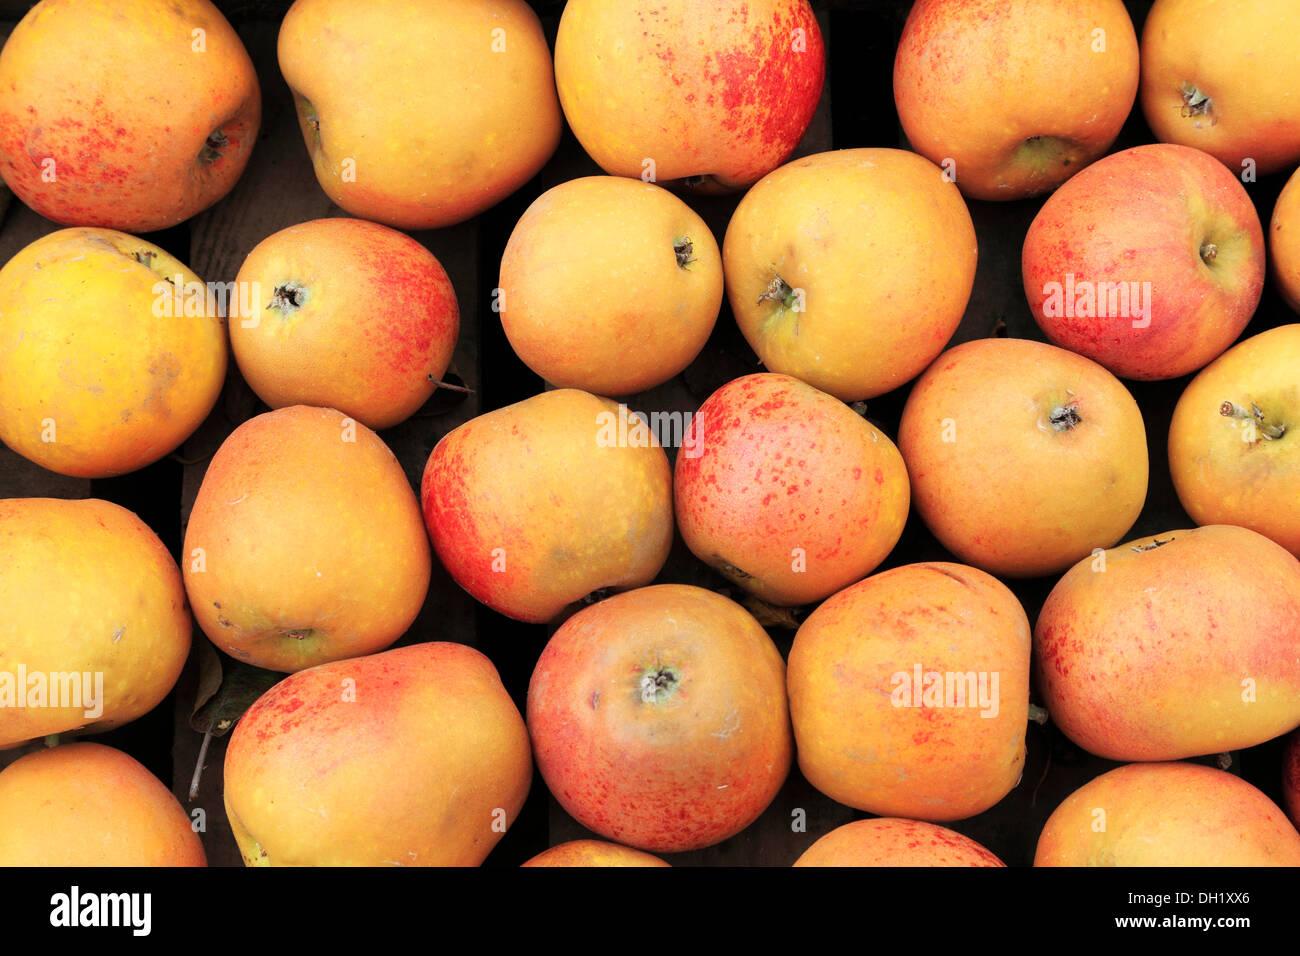 Apple 'Royal Norfolk Russet', Farm shop mostrar, manzanas UK Imagen De Stock